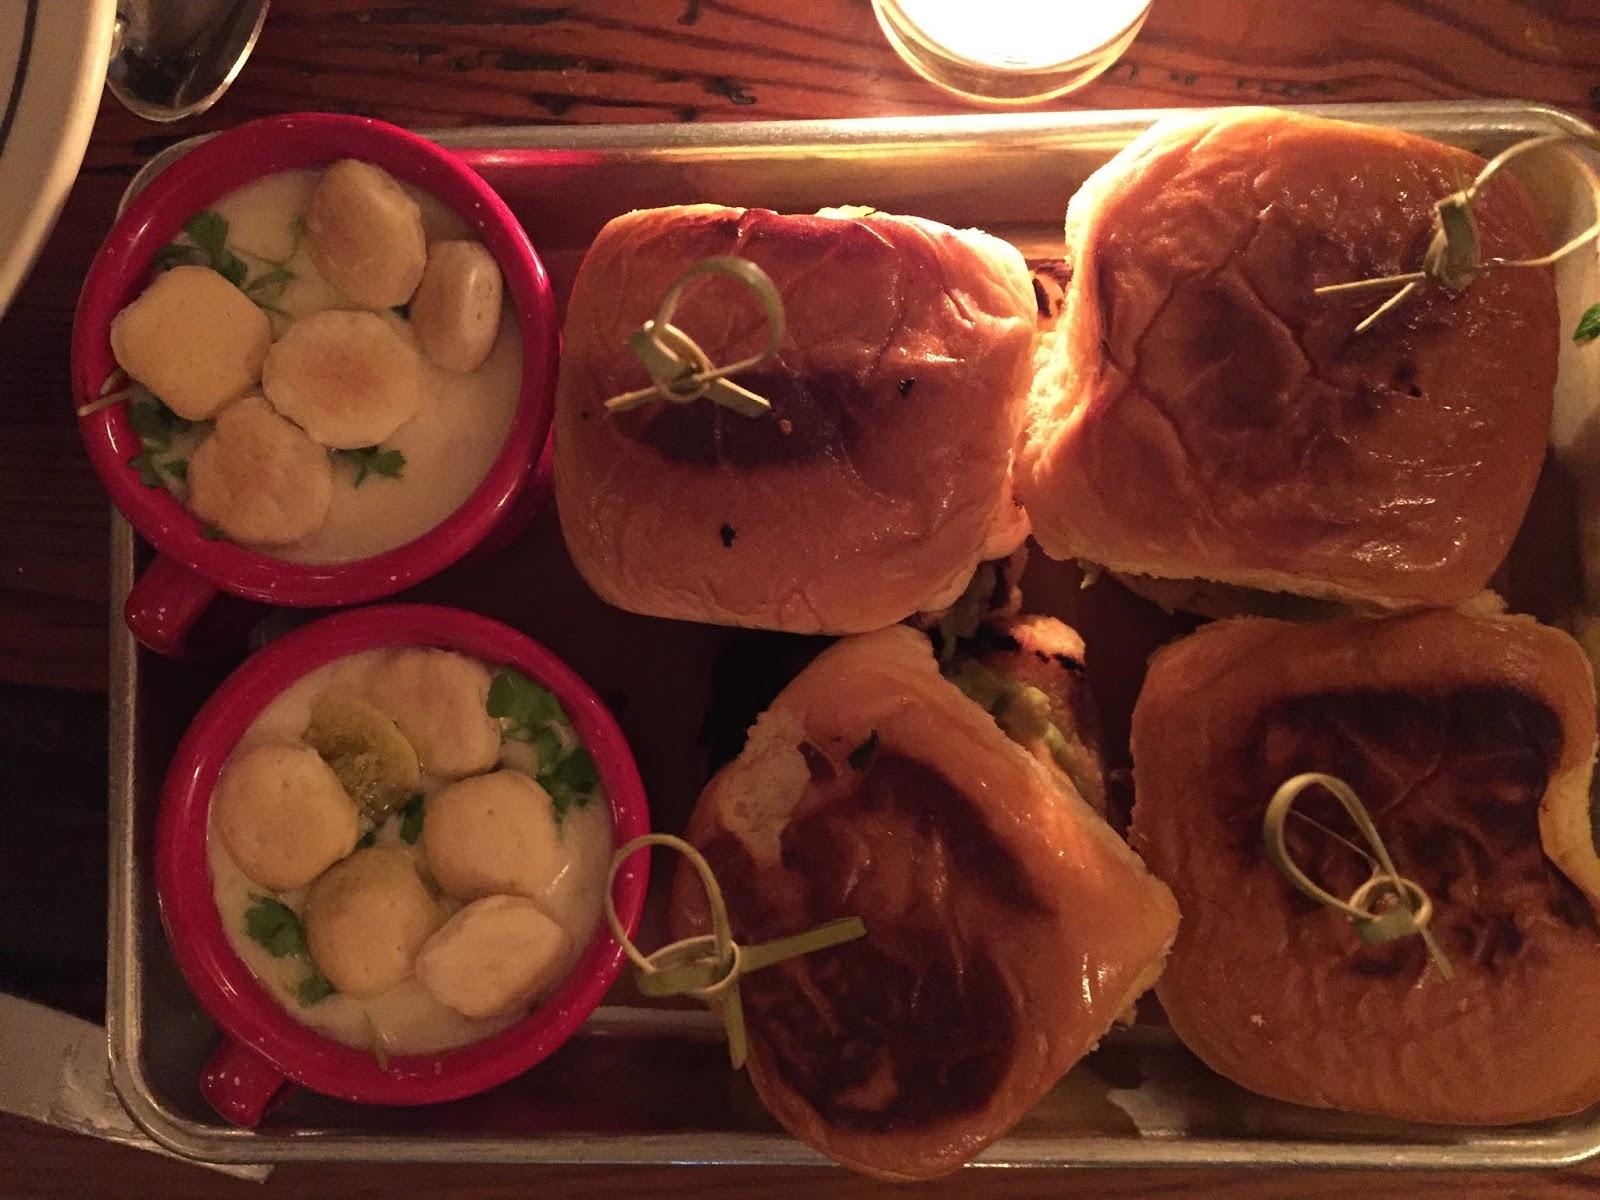 Eating Fabulously, Christopher Stewart, The Mermaid Inn, oysters, The Mermaid Inn happy hour